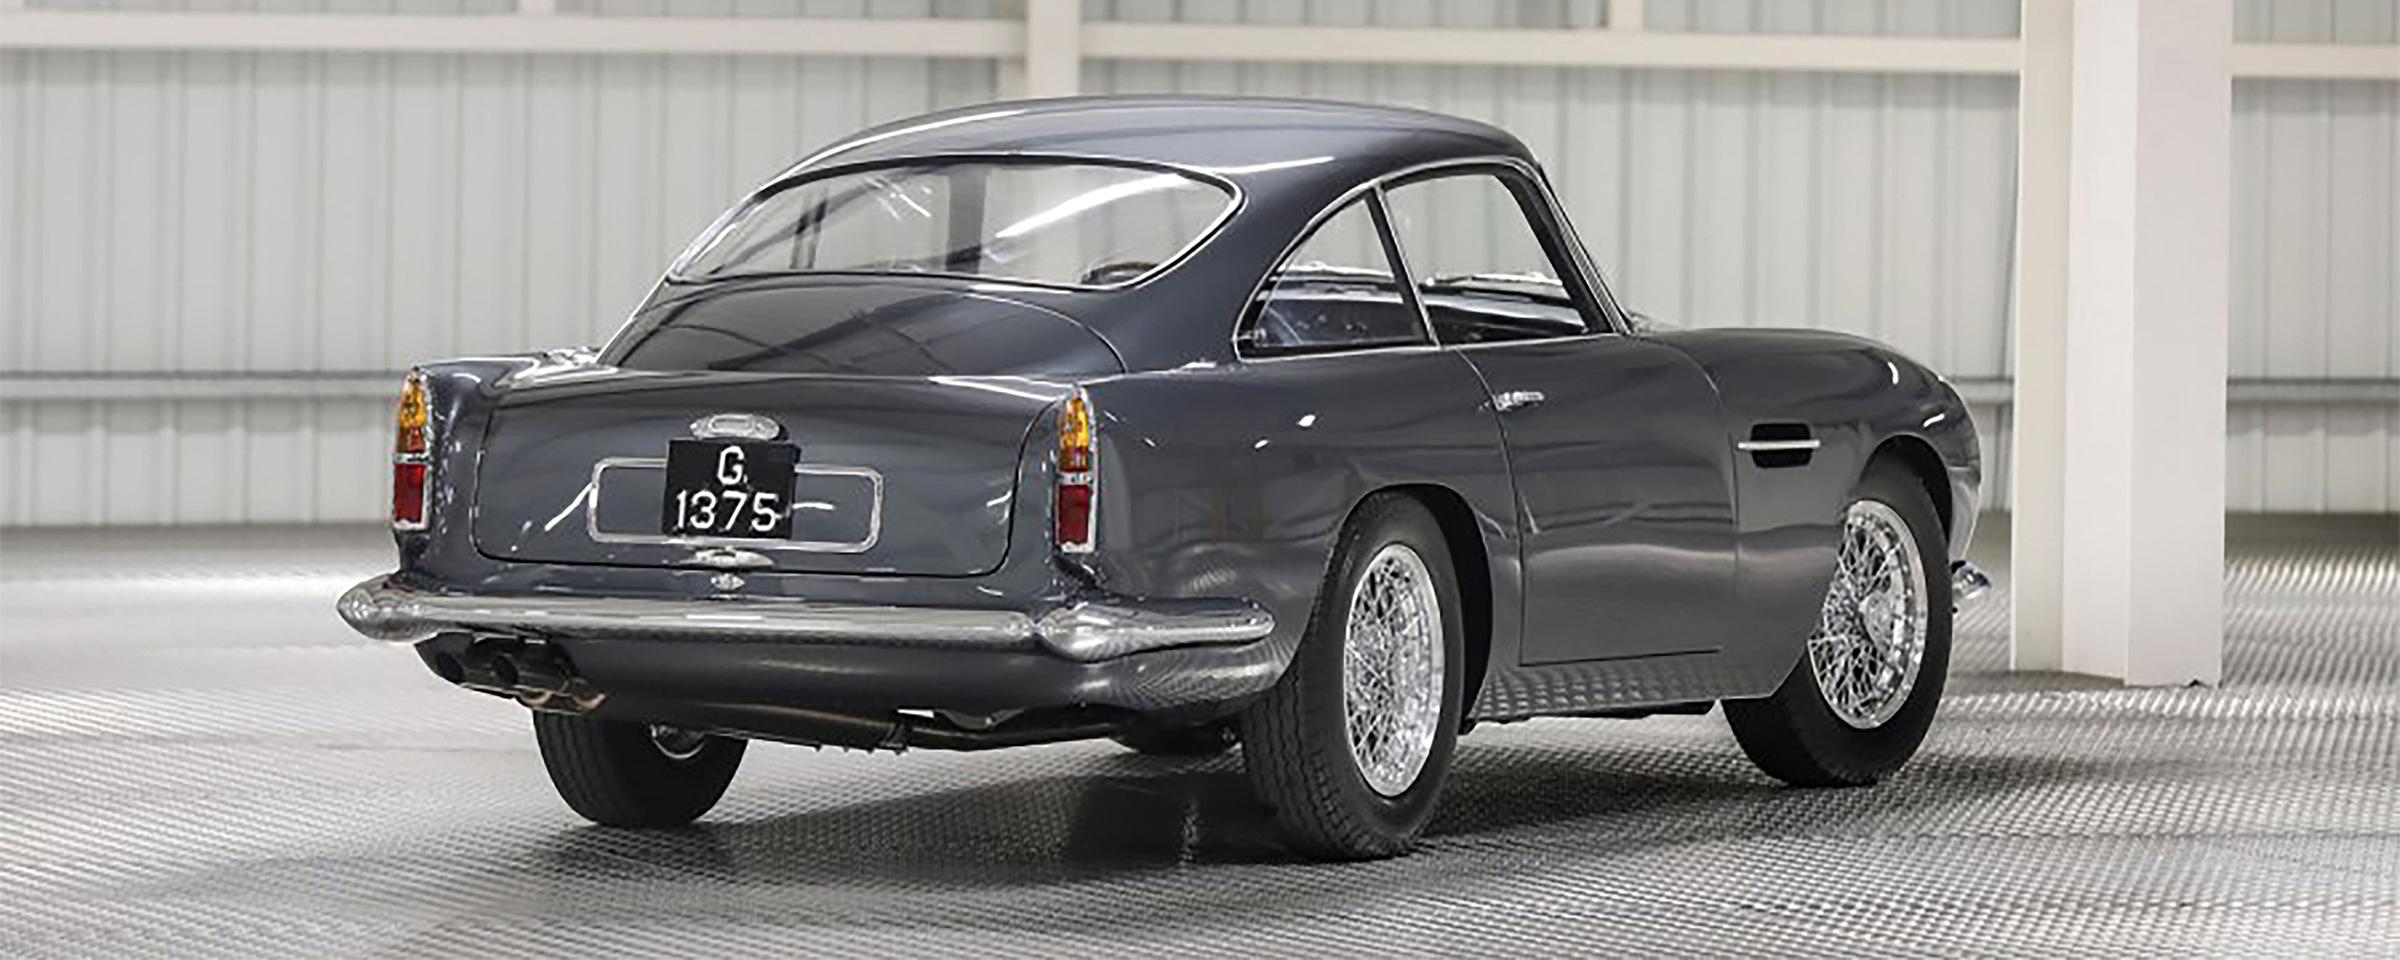 Silver 1961 Aston Martin DB4GT Rear Fenders, Lease an Aston Martin, #pfs_leasing